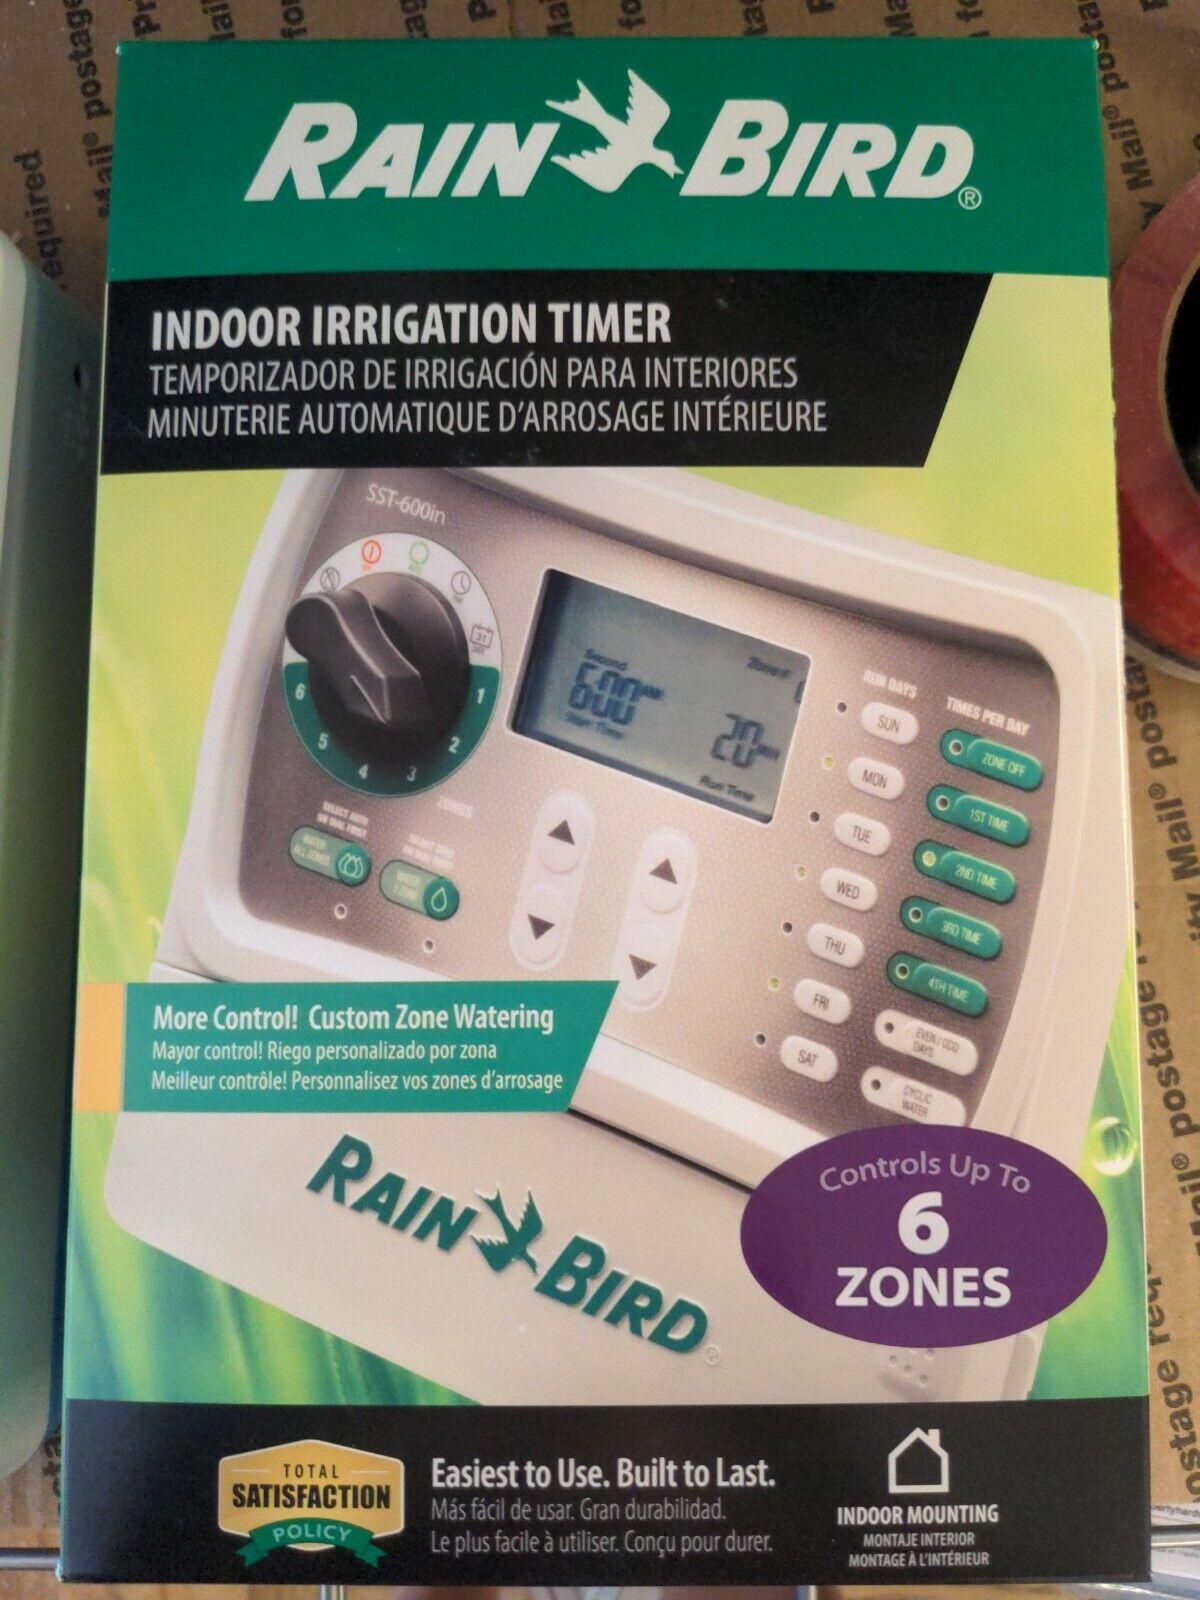 *NEW* RAINBIRD INDOOR IRRIGATION TIMER (6-ZONE) MODEL: SST-600I (CP1000613)